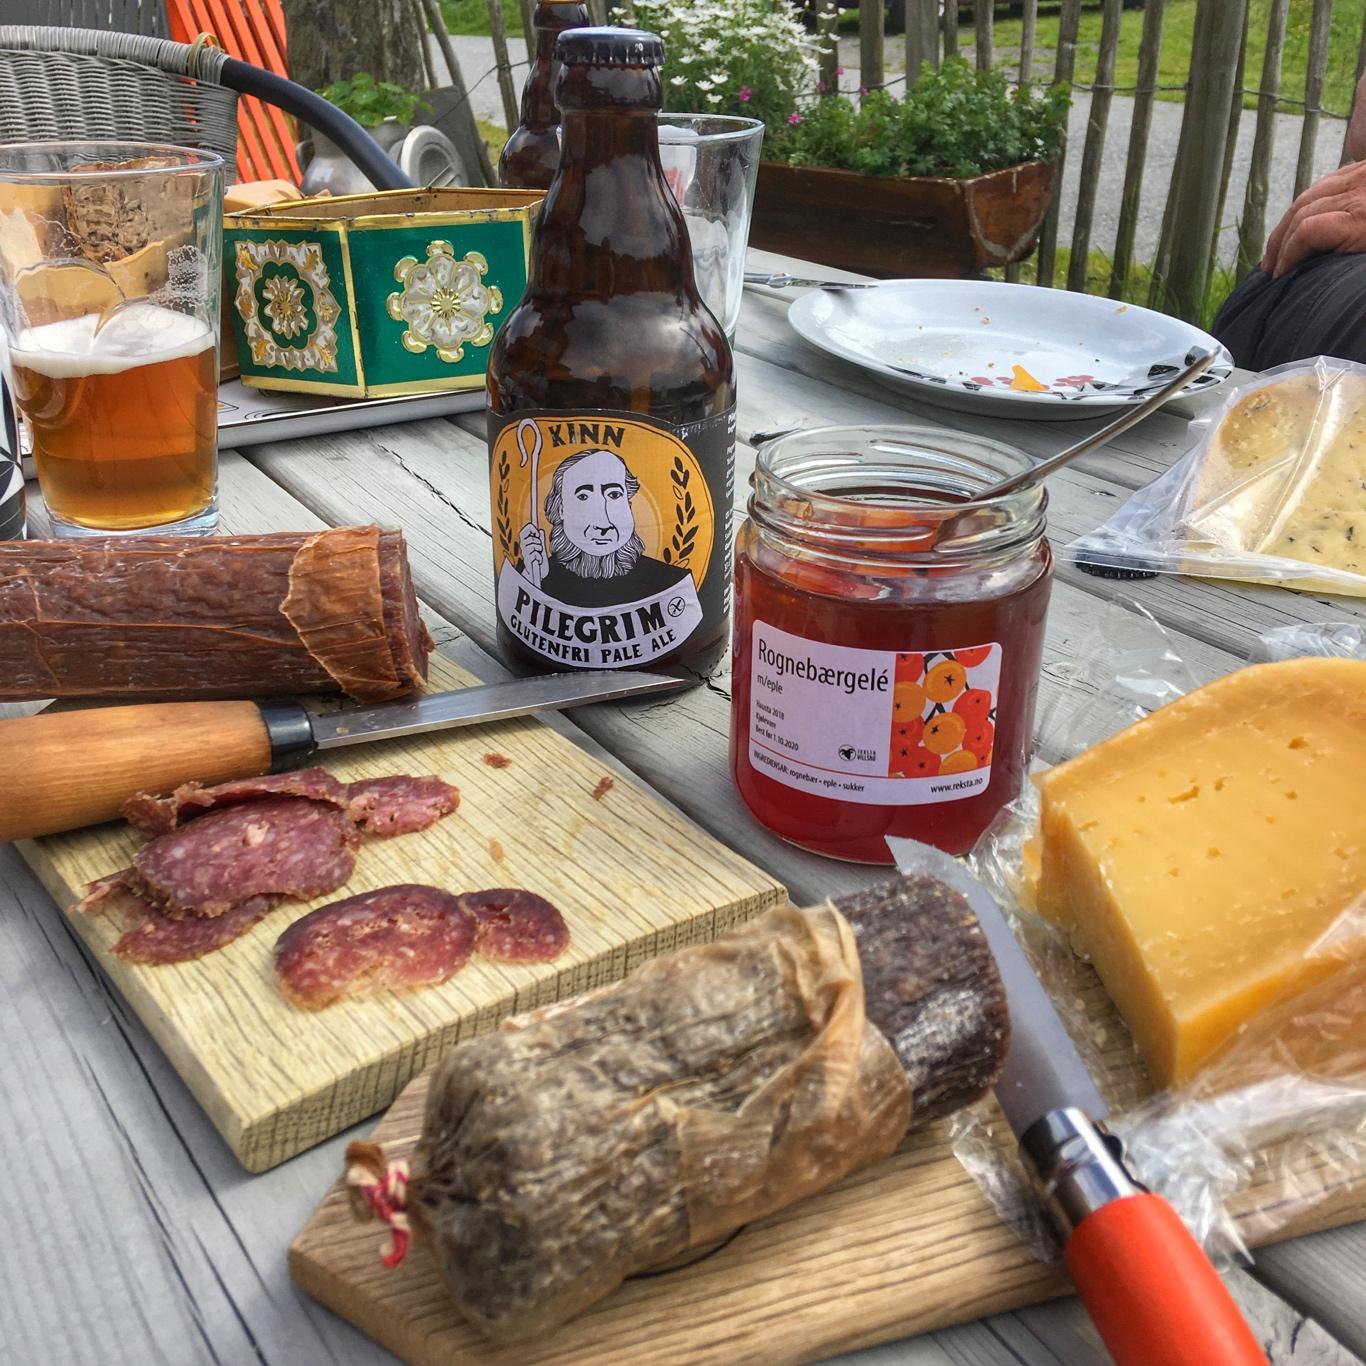 Pølse frå Reksta // ost frå Ostegården // øl frå Kinn